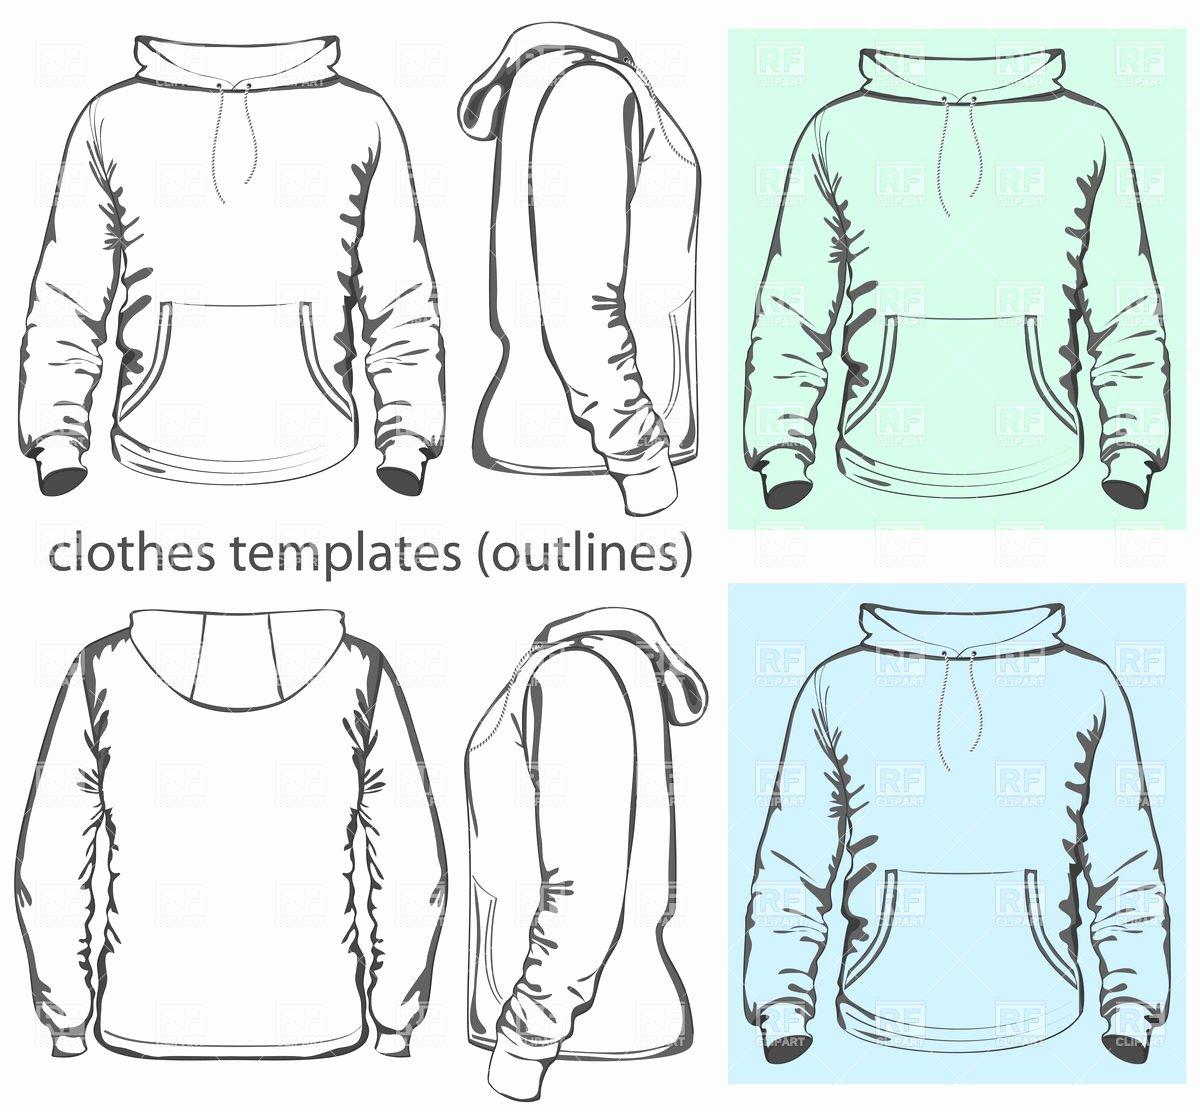 Hooded Sweatshirt Template Lovely Men S Hooded Sweatshirt Template with Pocket On Belly